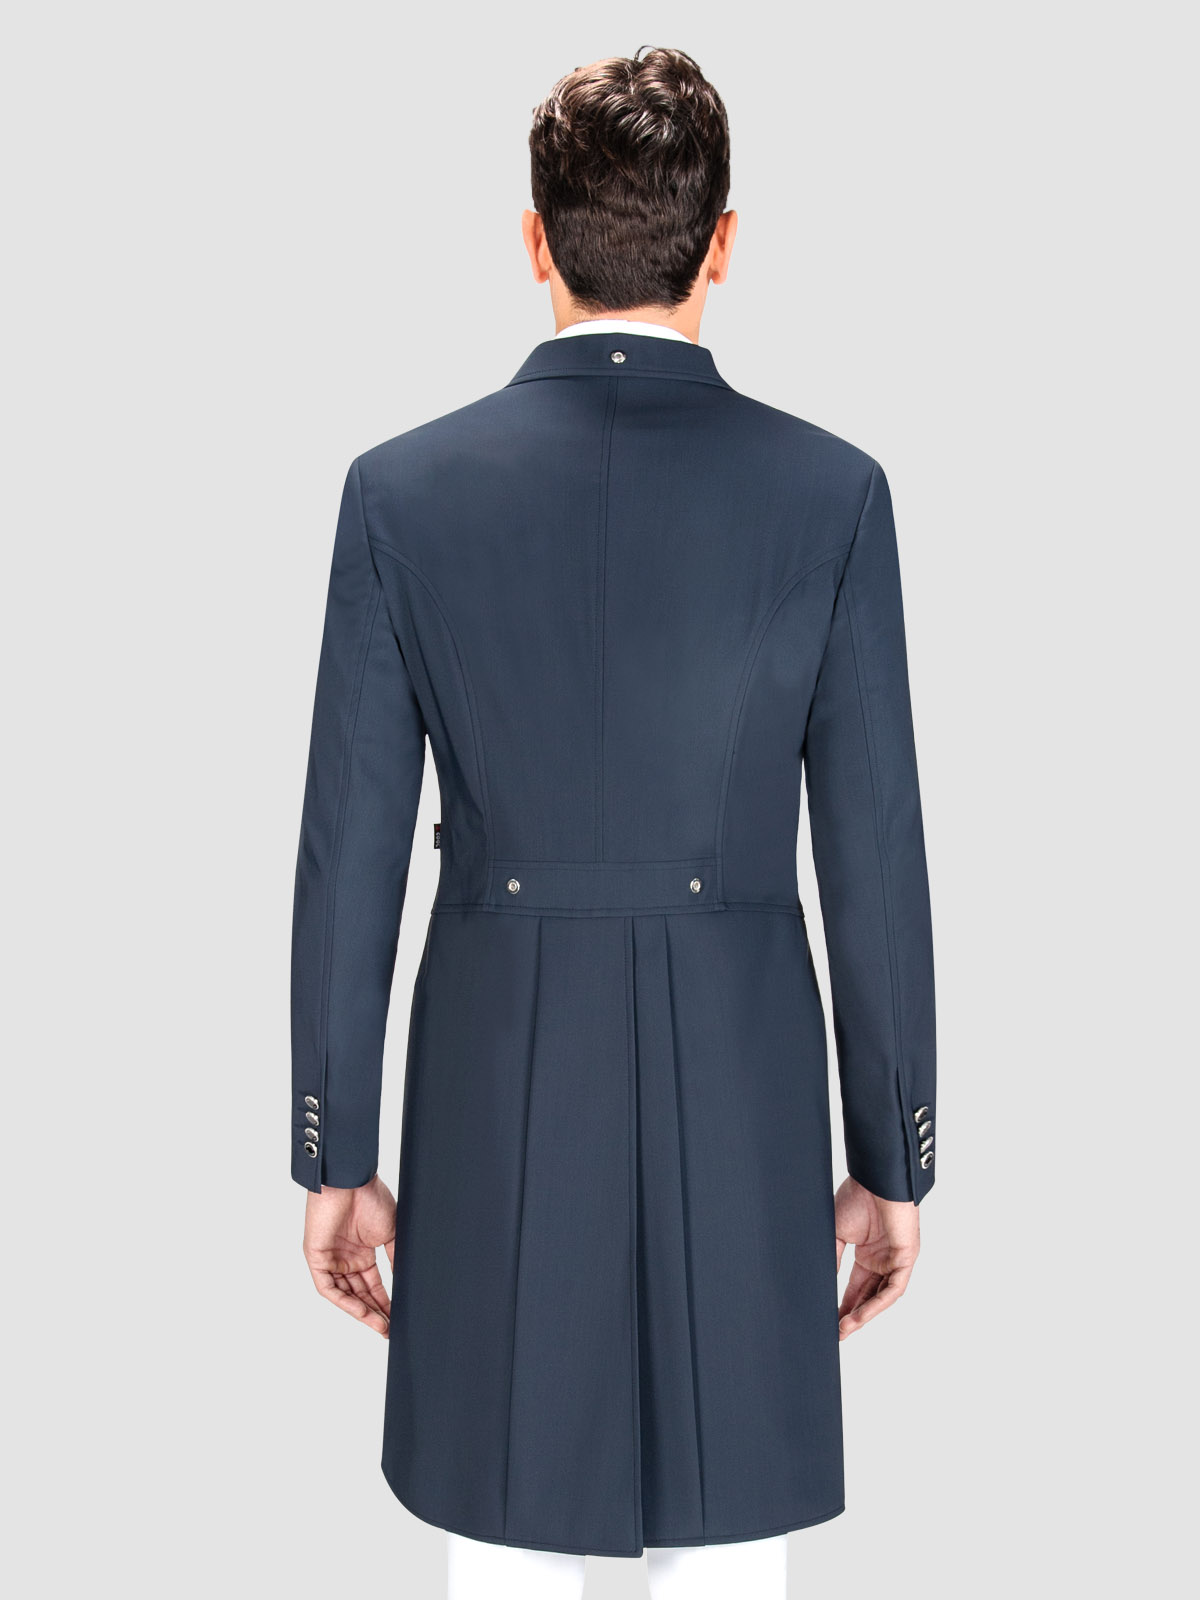 CANTER Men's Dressage Tailcoat X Cool Evo 1